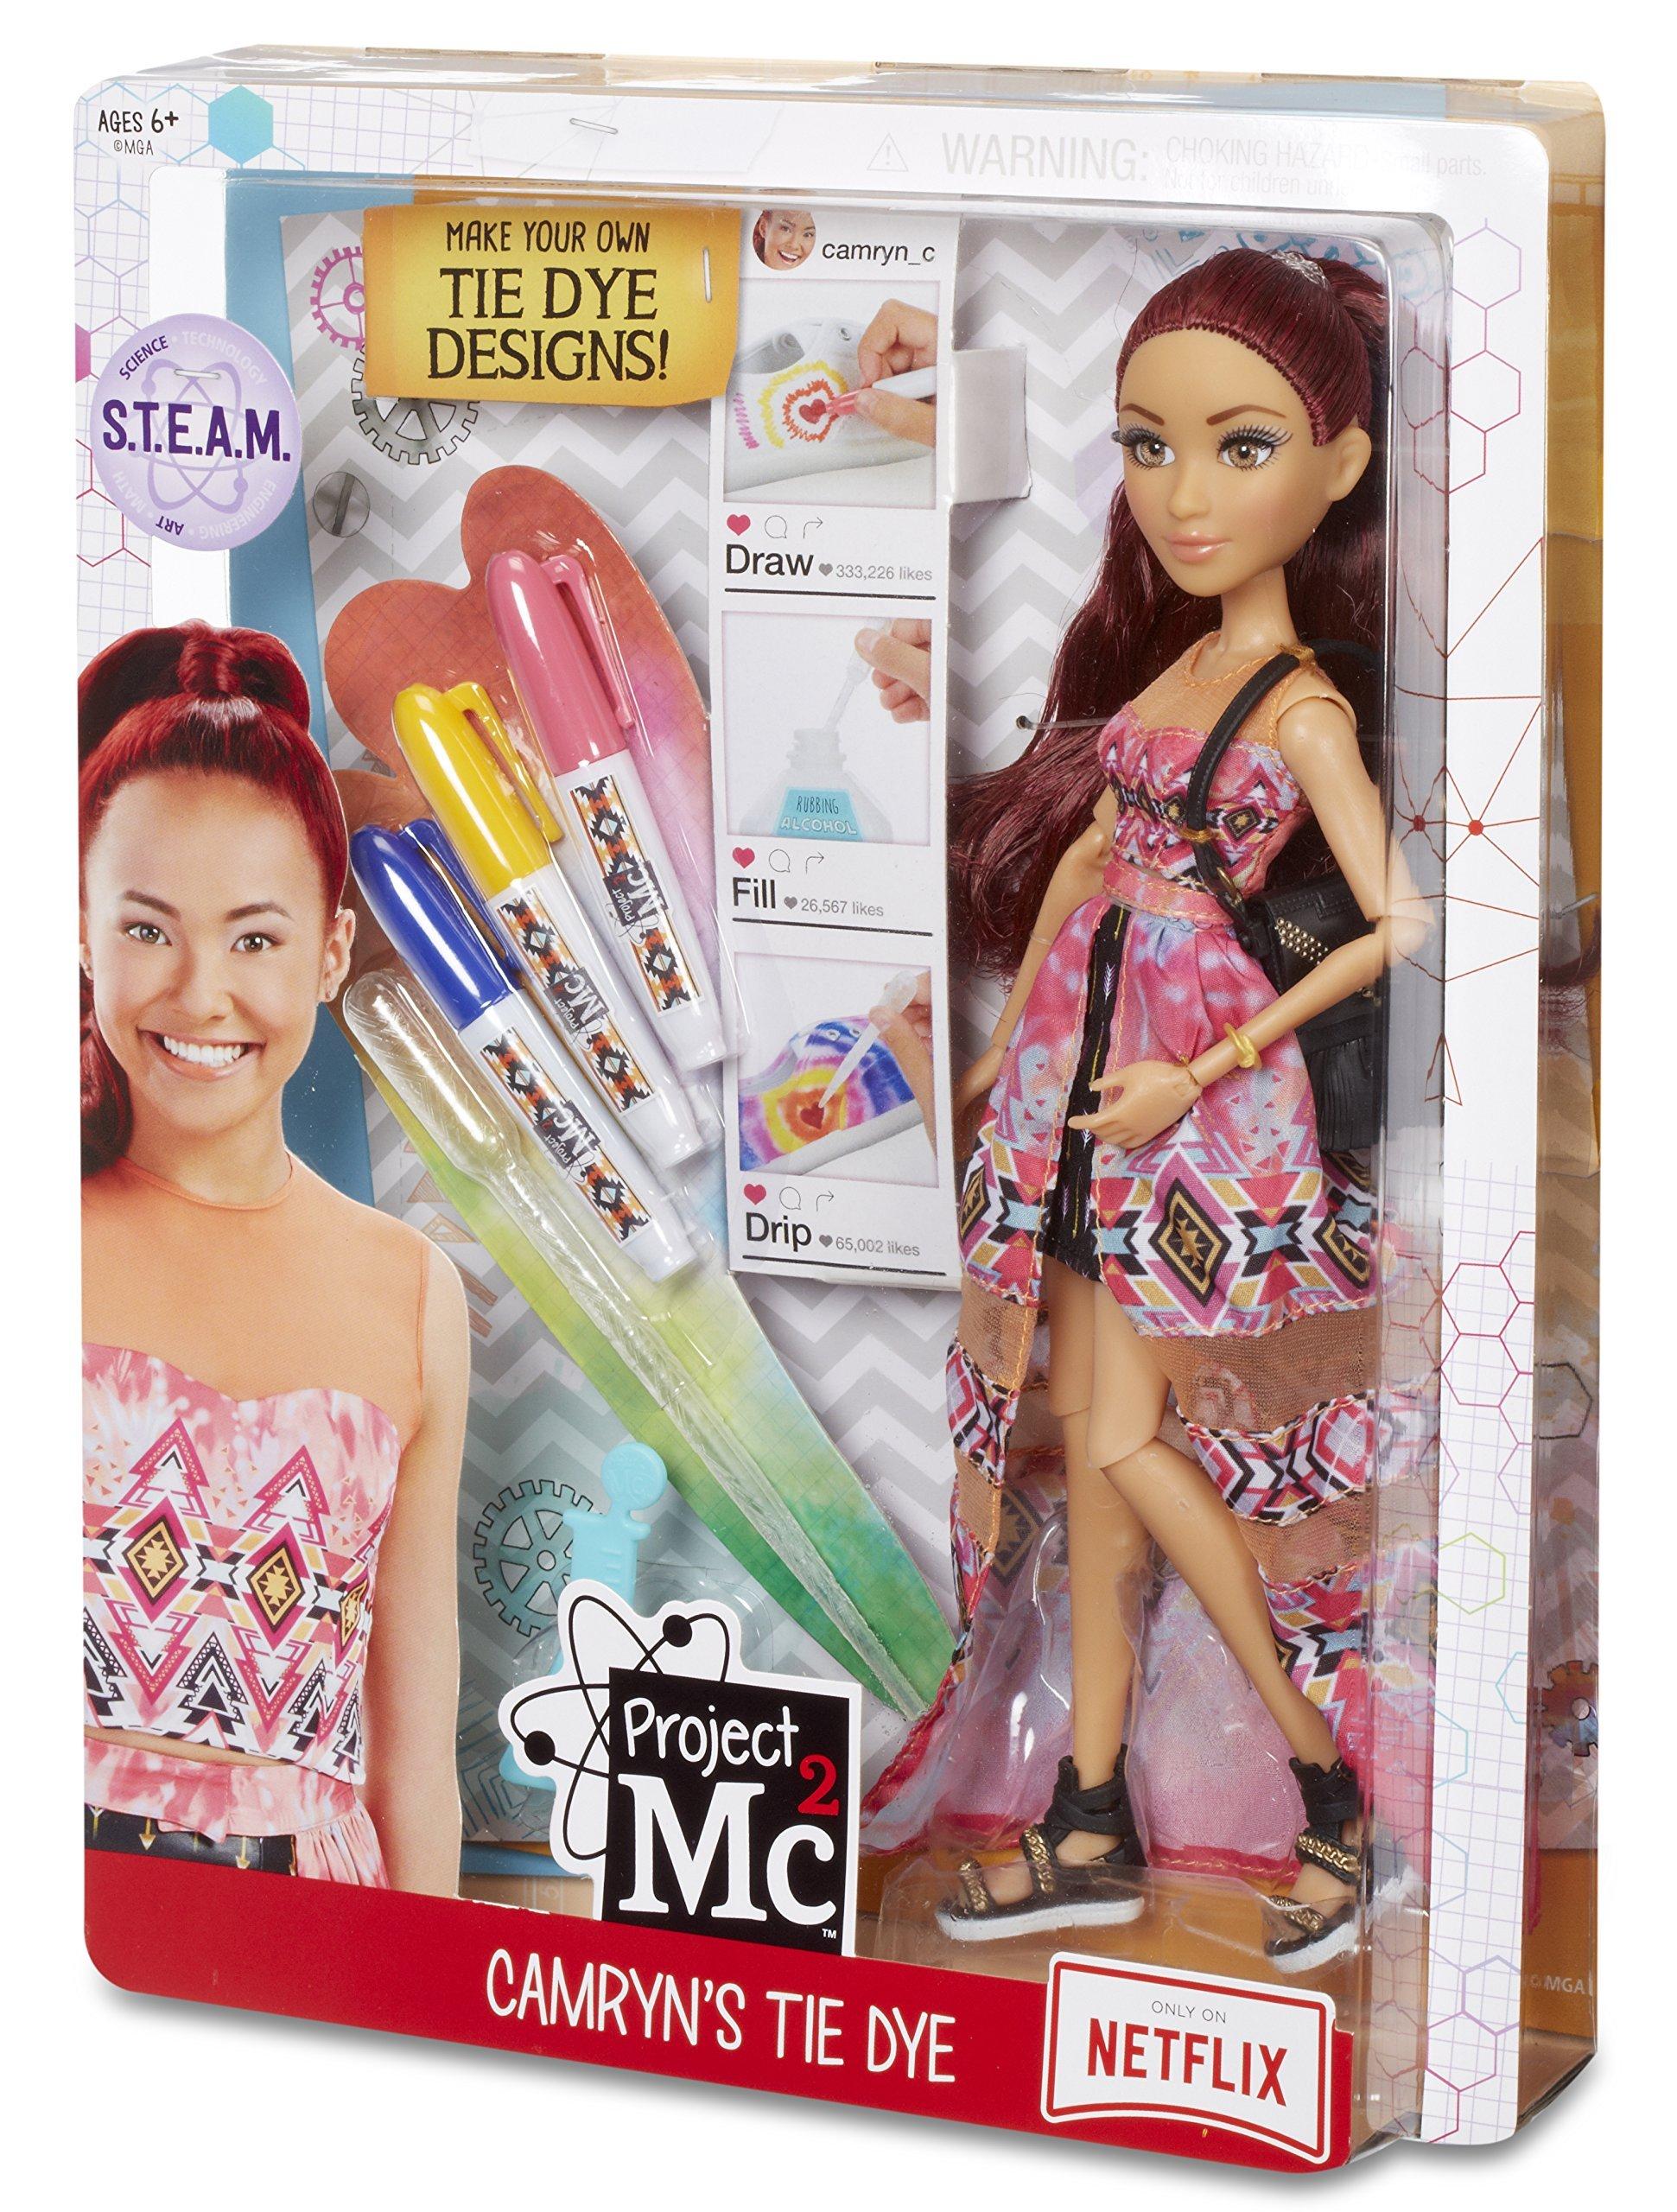 MGA Project MC2 Camryn's Tie Dye Toy lelle 545132